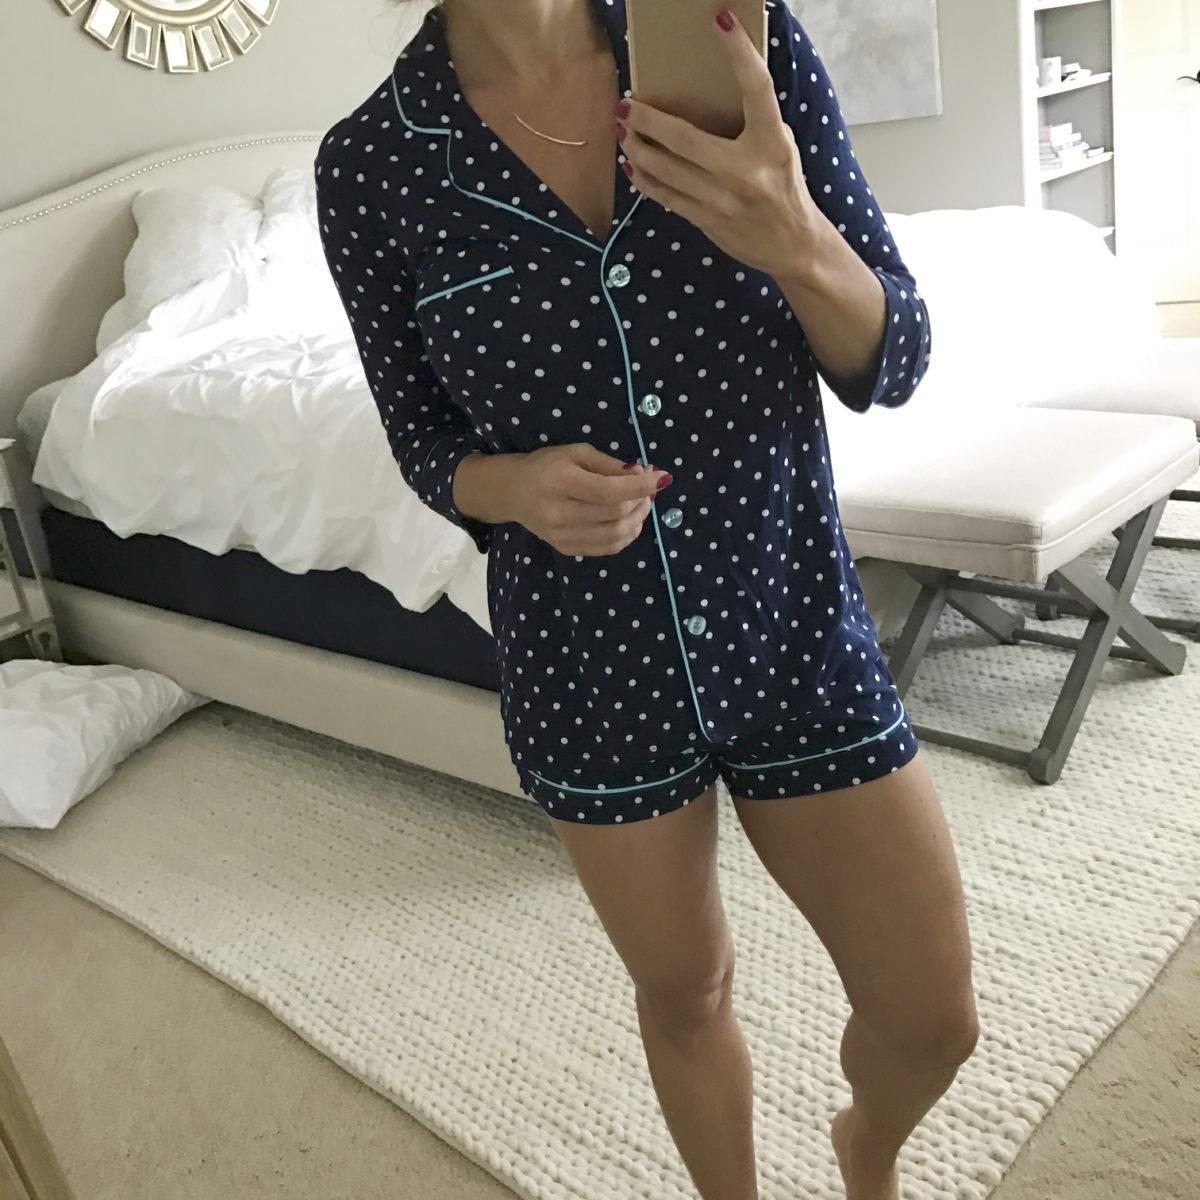 Nordstrom Anniversary Sale 2017 PJ Salvage Pajama Set